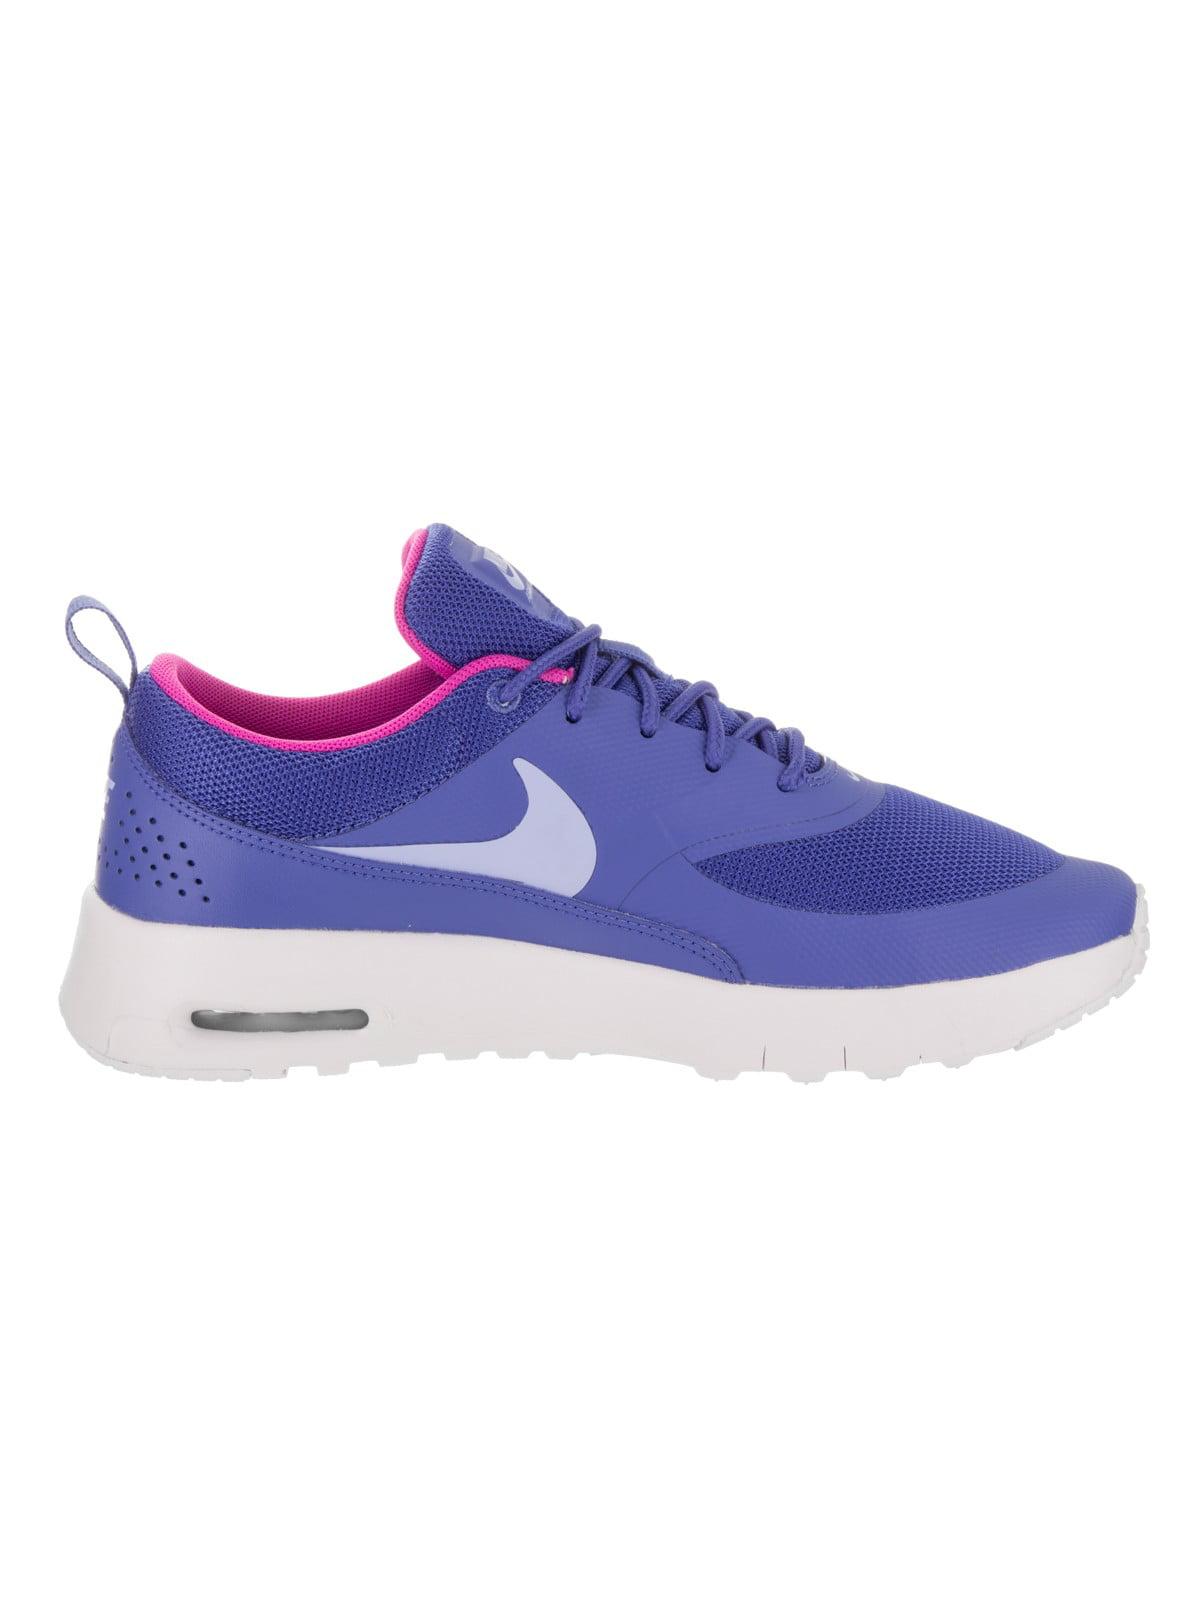 Nike Kids Air Max Thea Running Shoe 843746-404 Blue//White